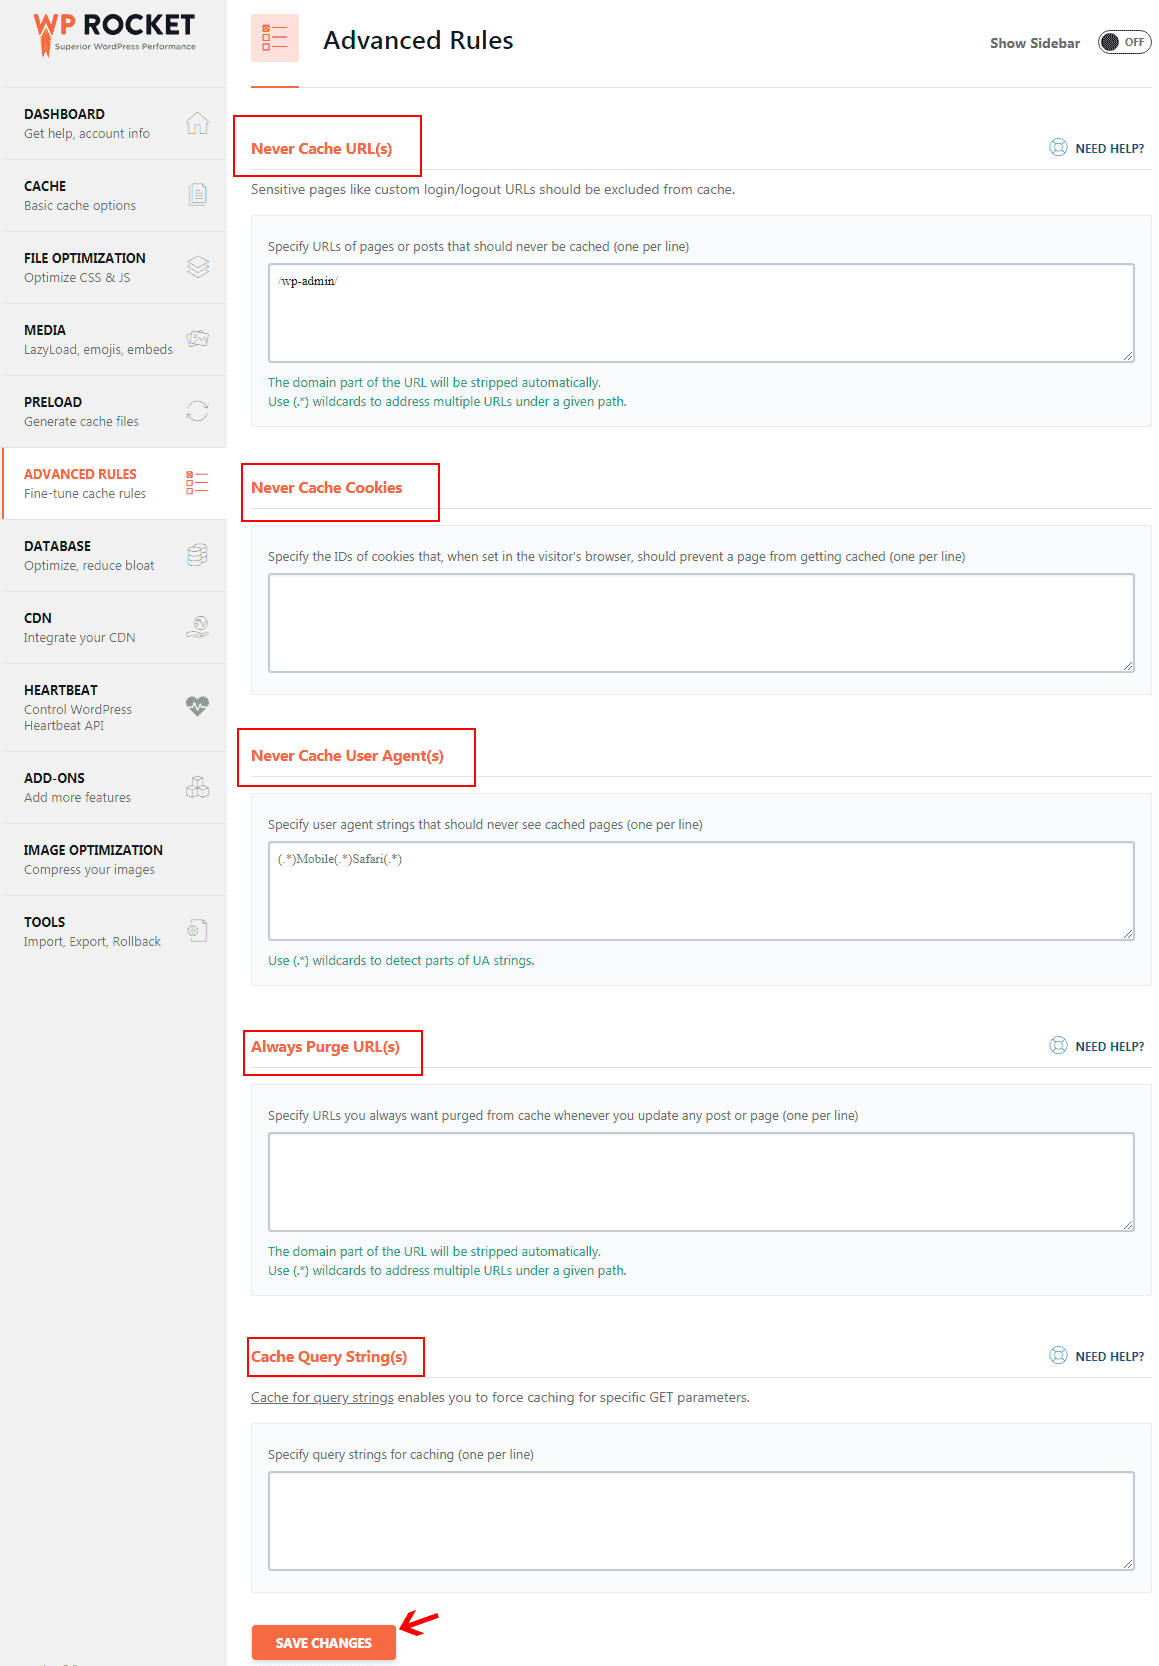 WP Rocket advance rules settings